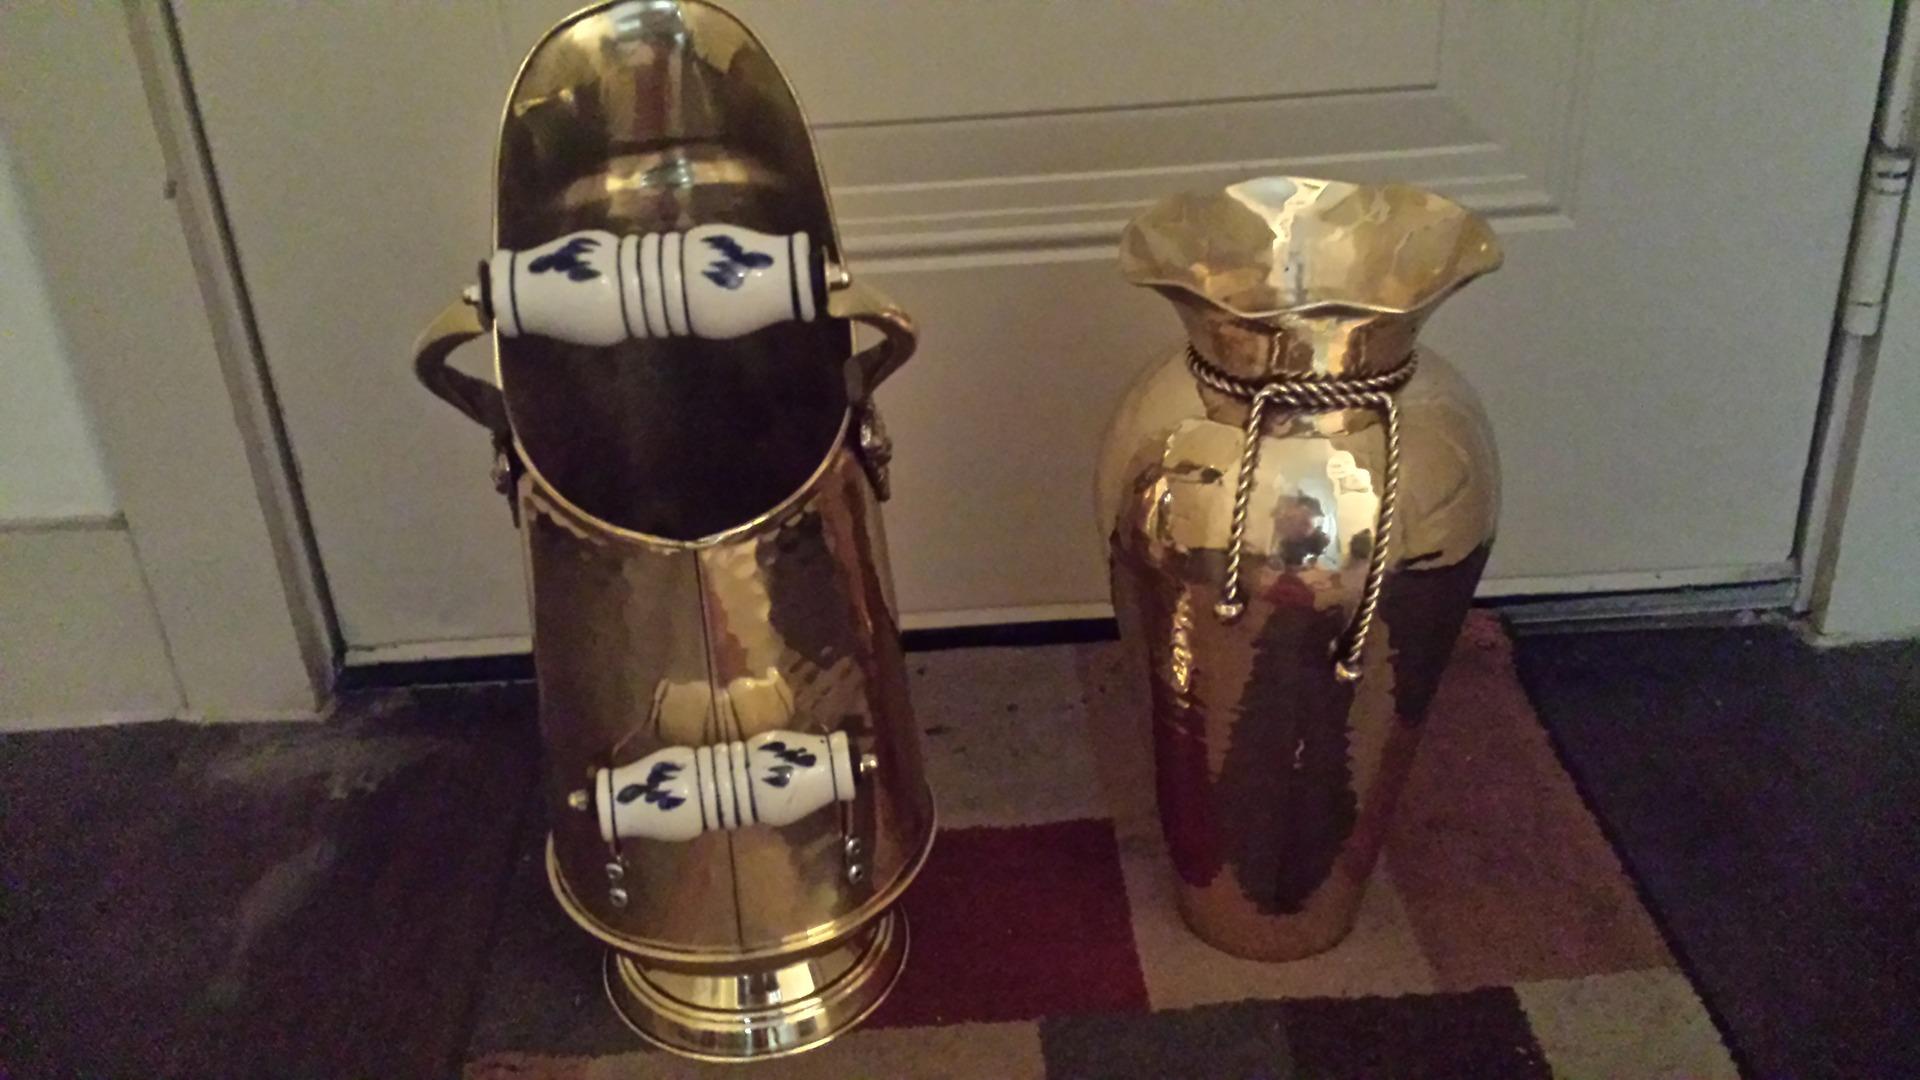 Antique Restoration, Brass Polishing, Chrome Plating